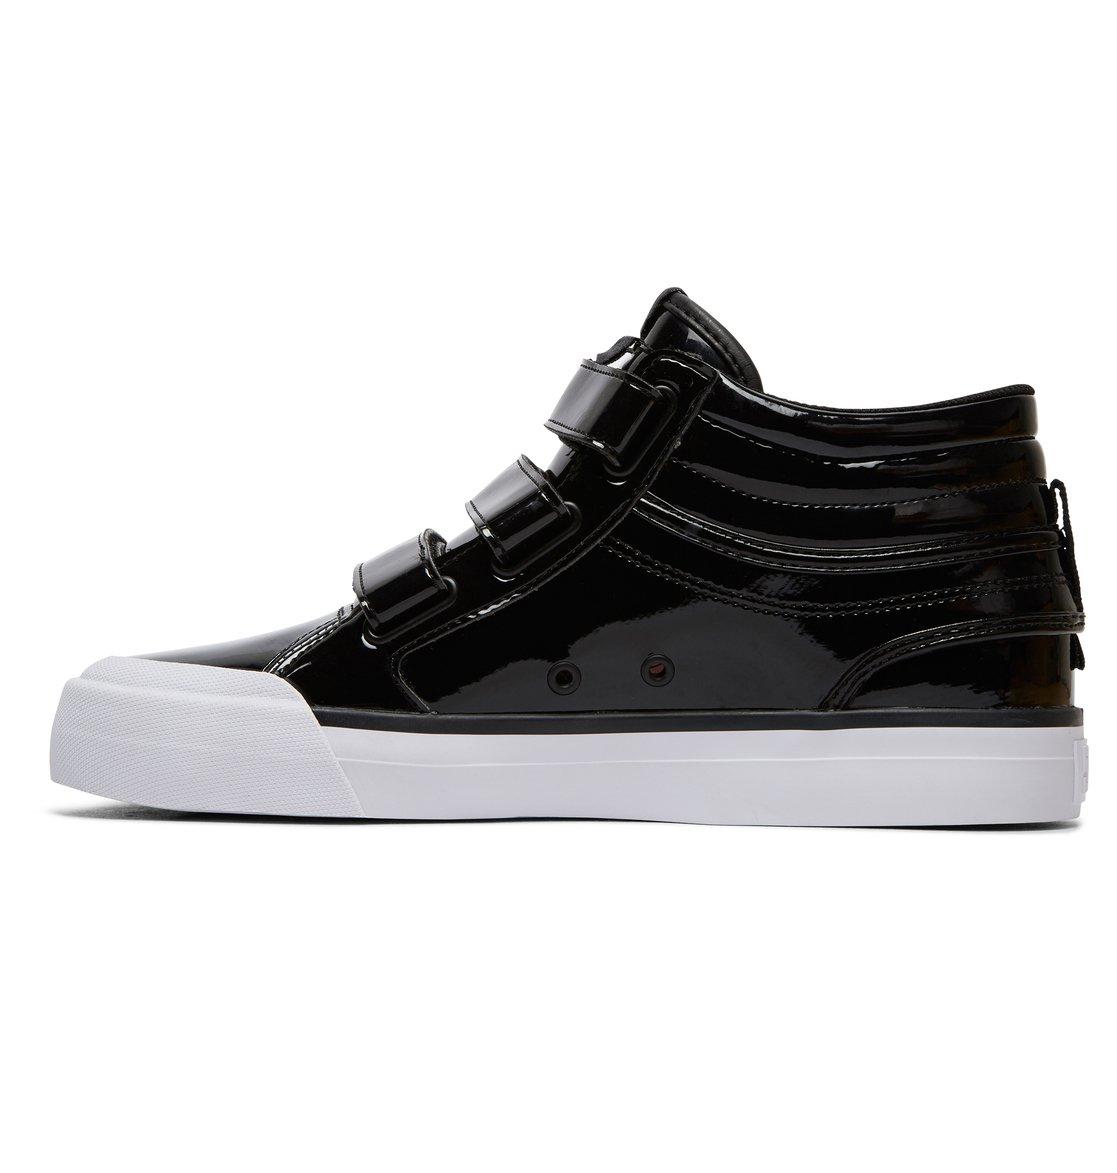 dc shoes Evan Hi - Scarpe alte da Ragazzo - Black - DC Shoes